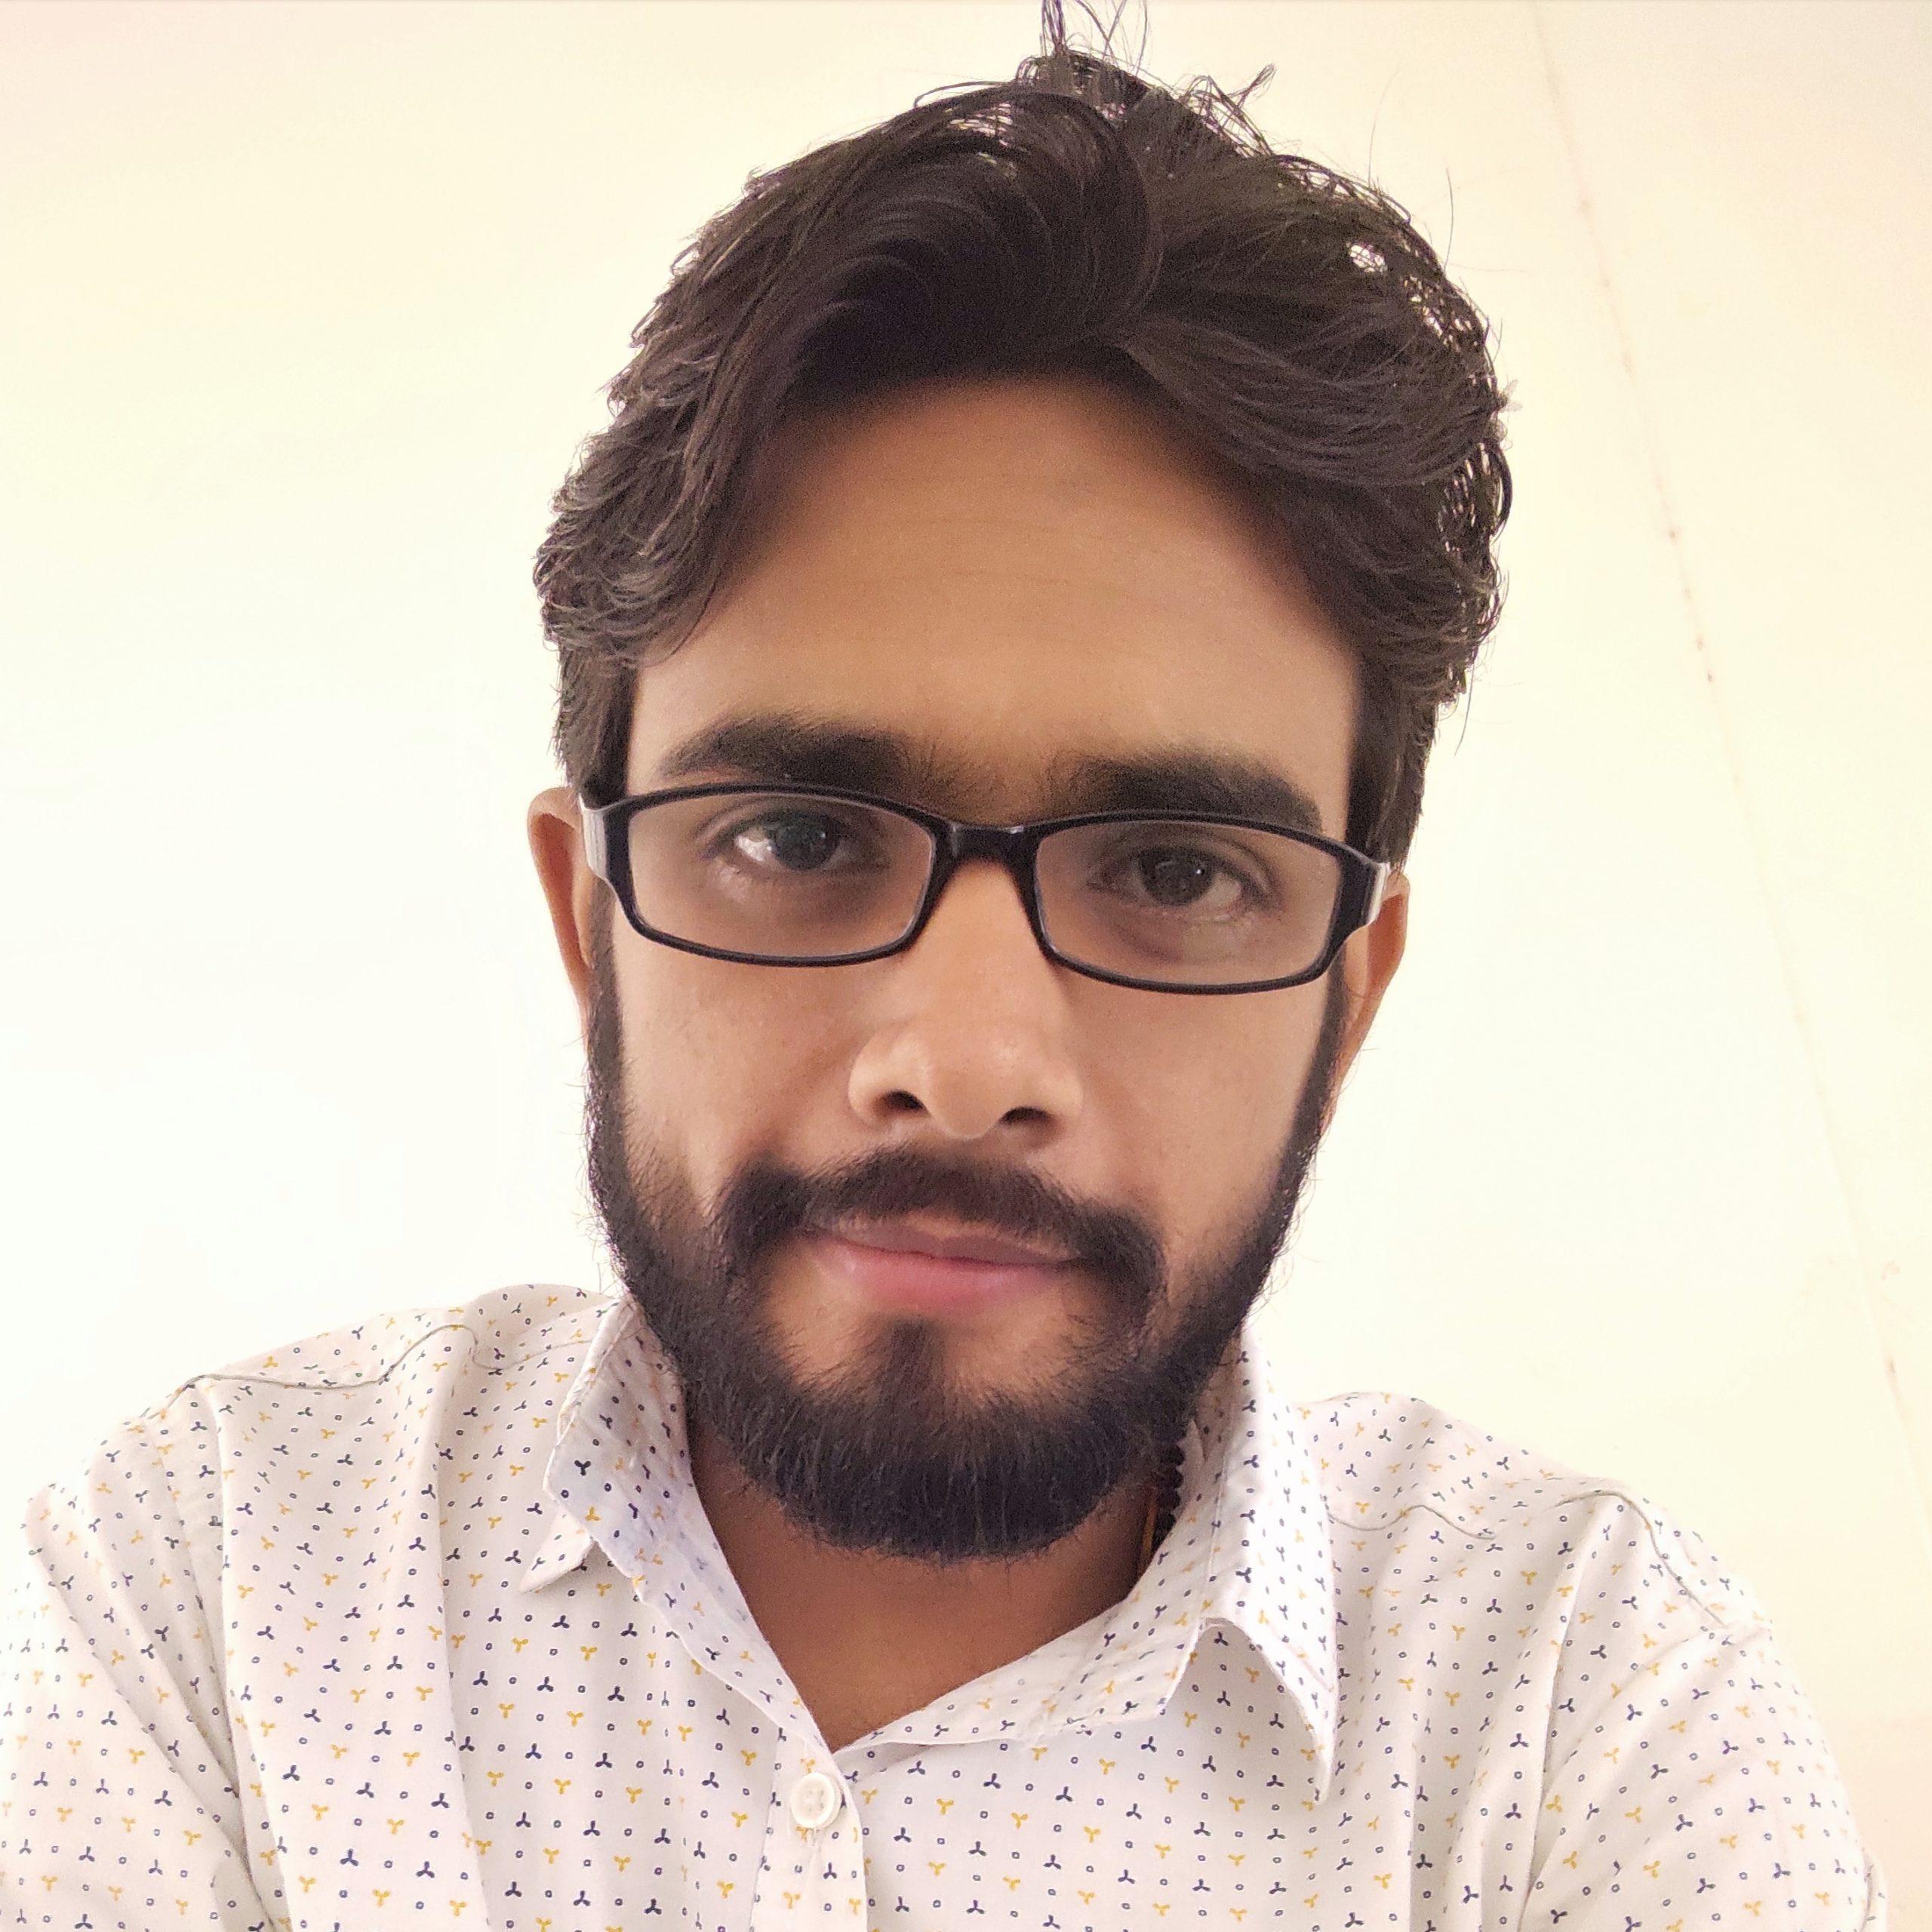 Photo of Rajat Pandey